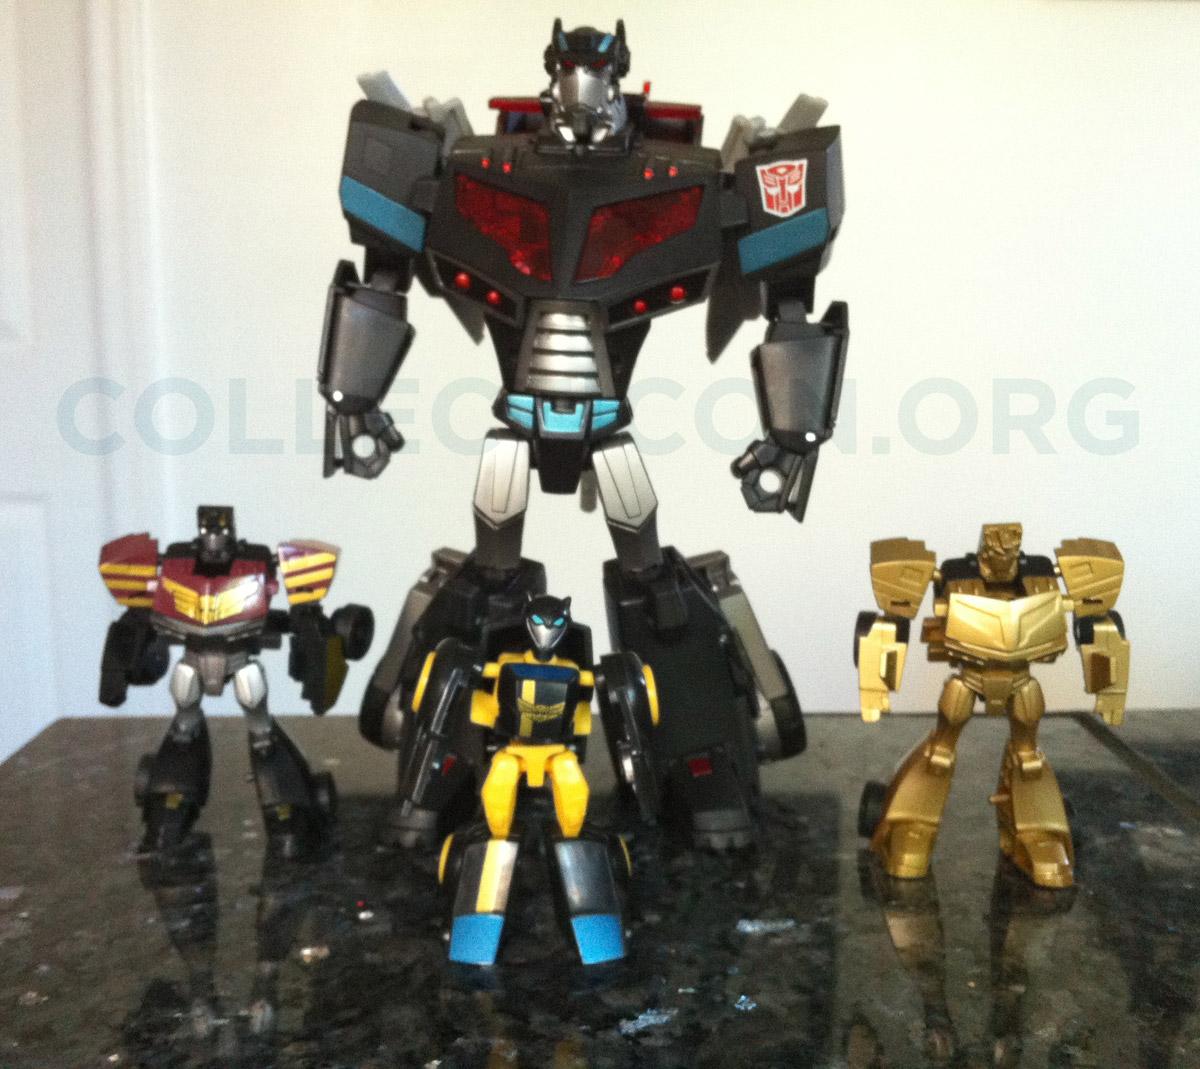 Collecticon's TakaraTomy EZ Collection 4 Elite Guard autobots & Black Convoy